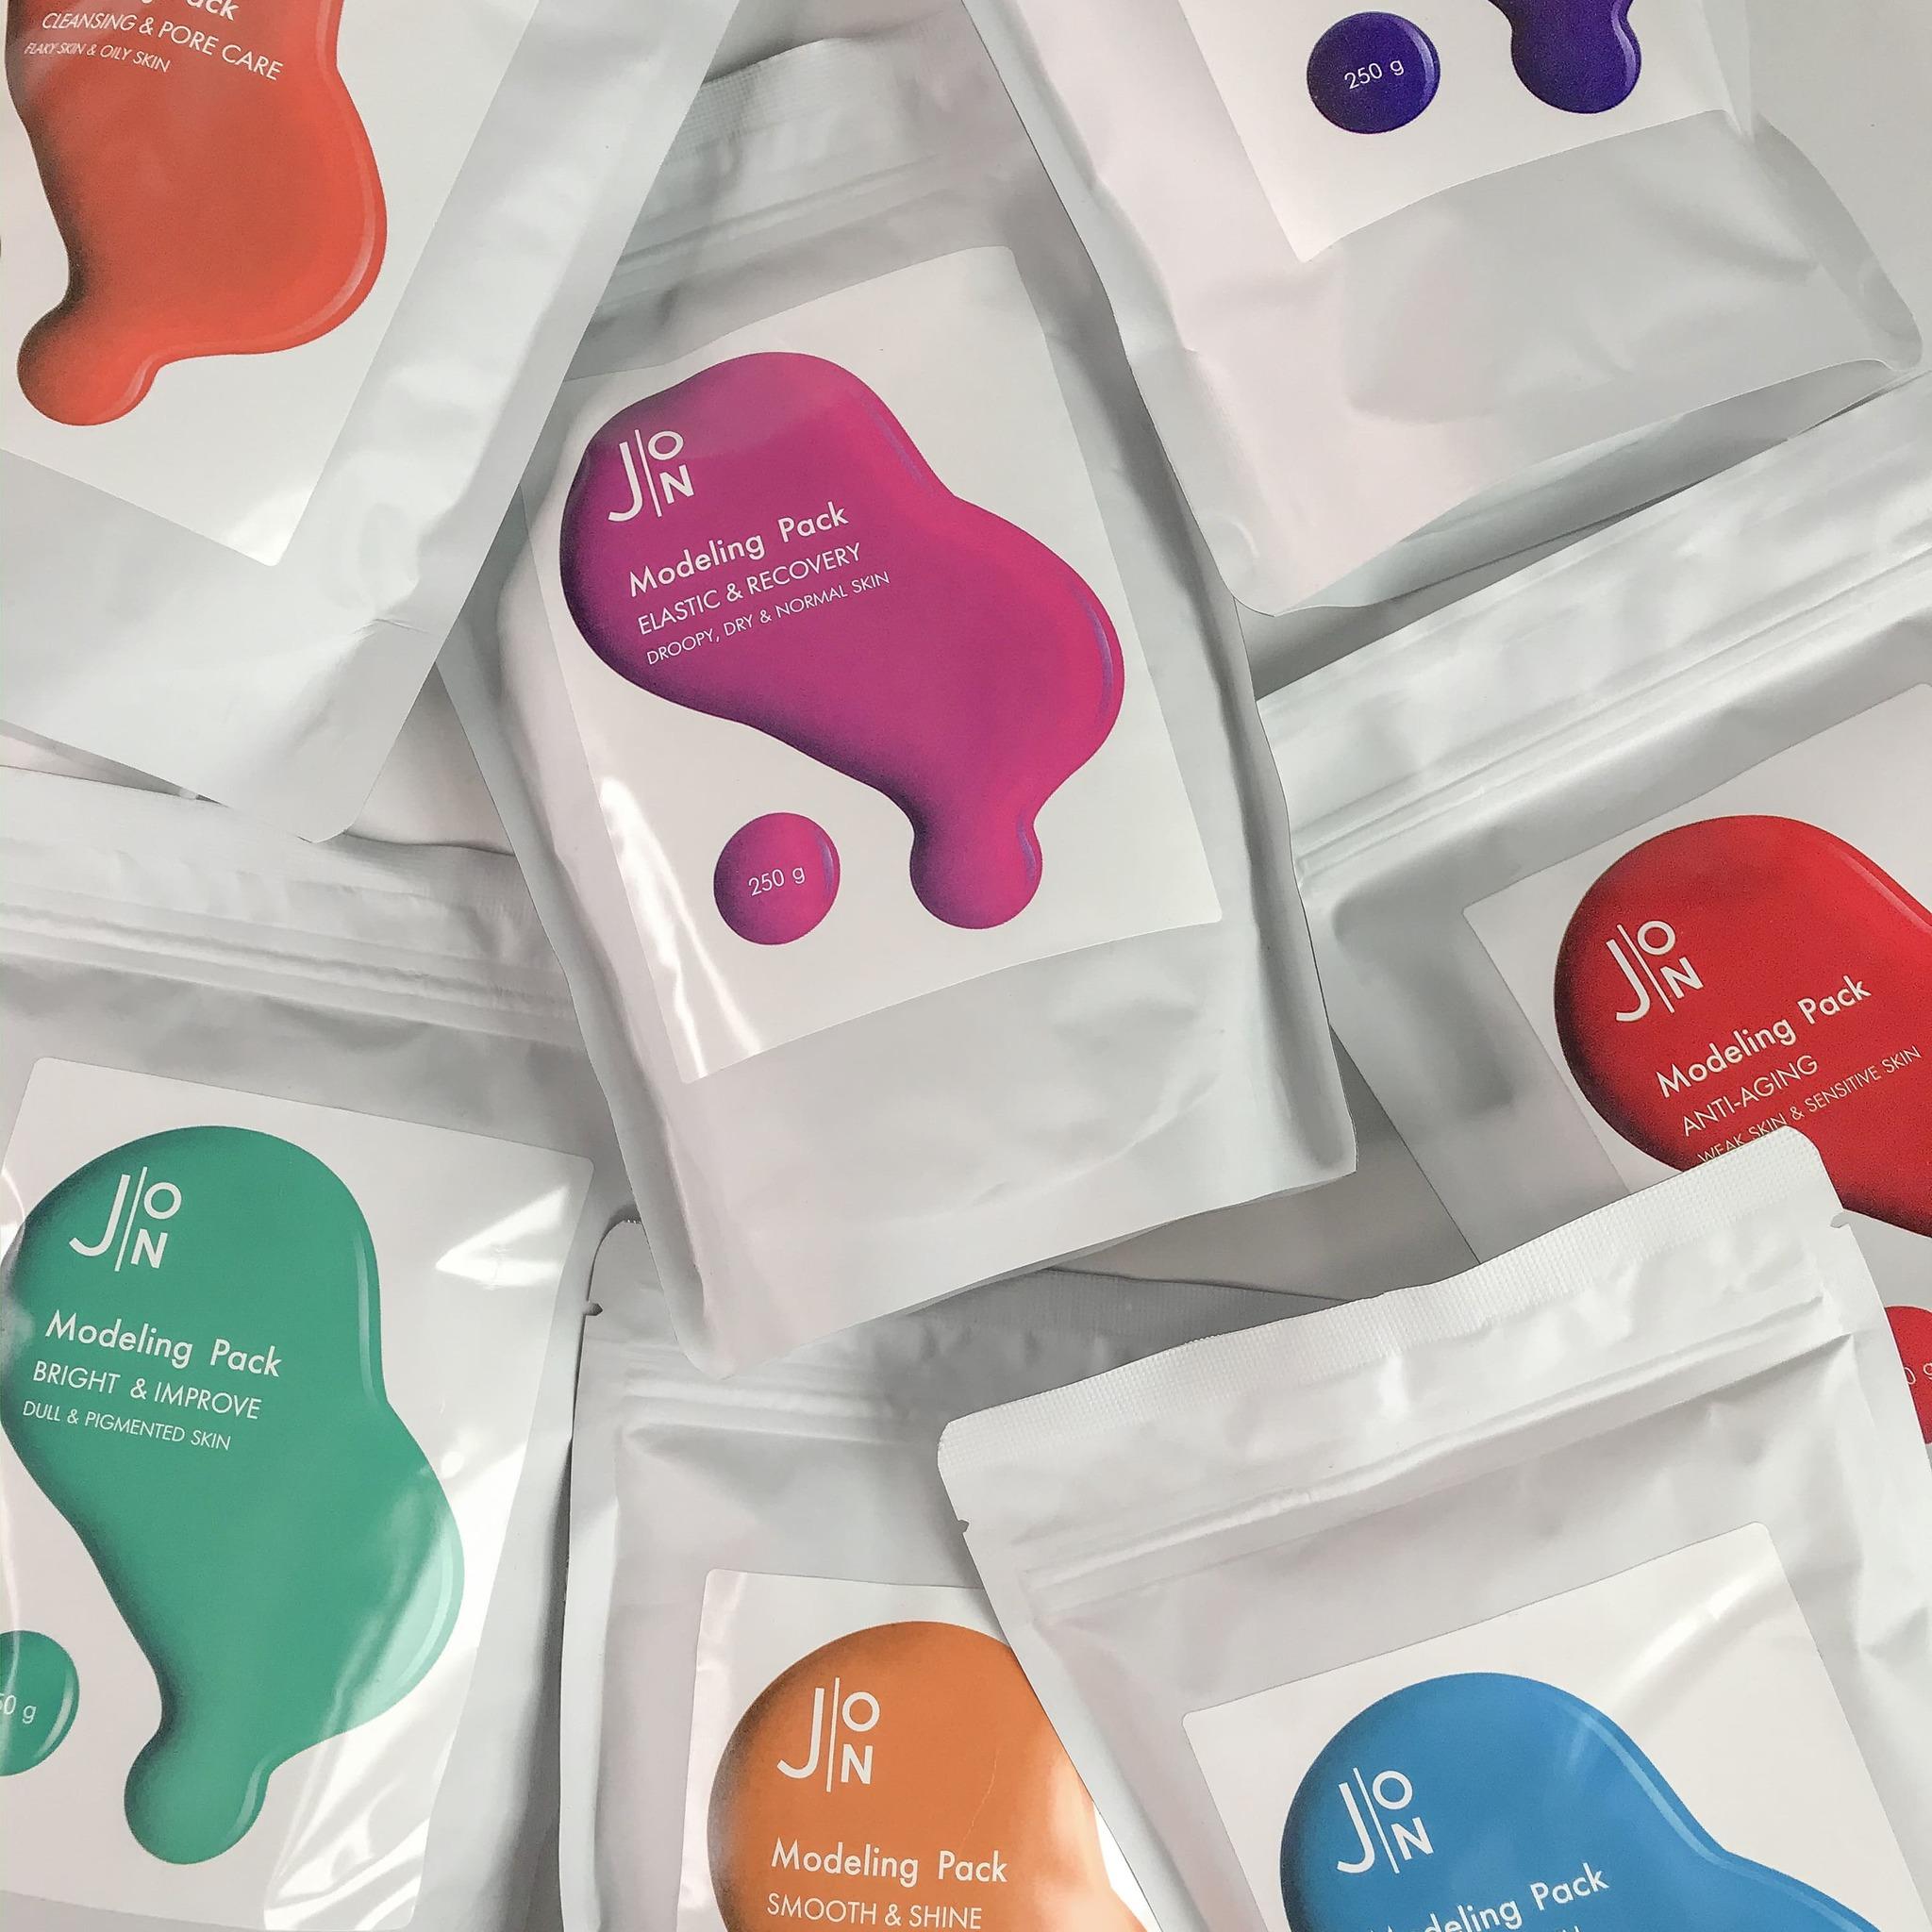 J:ON Anti-Aging Modeling Pack - Альгинатная антивозрастная маска для лица